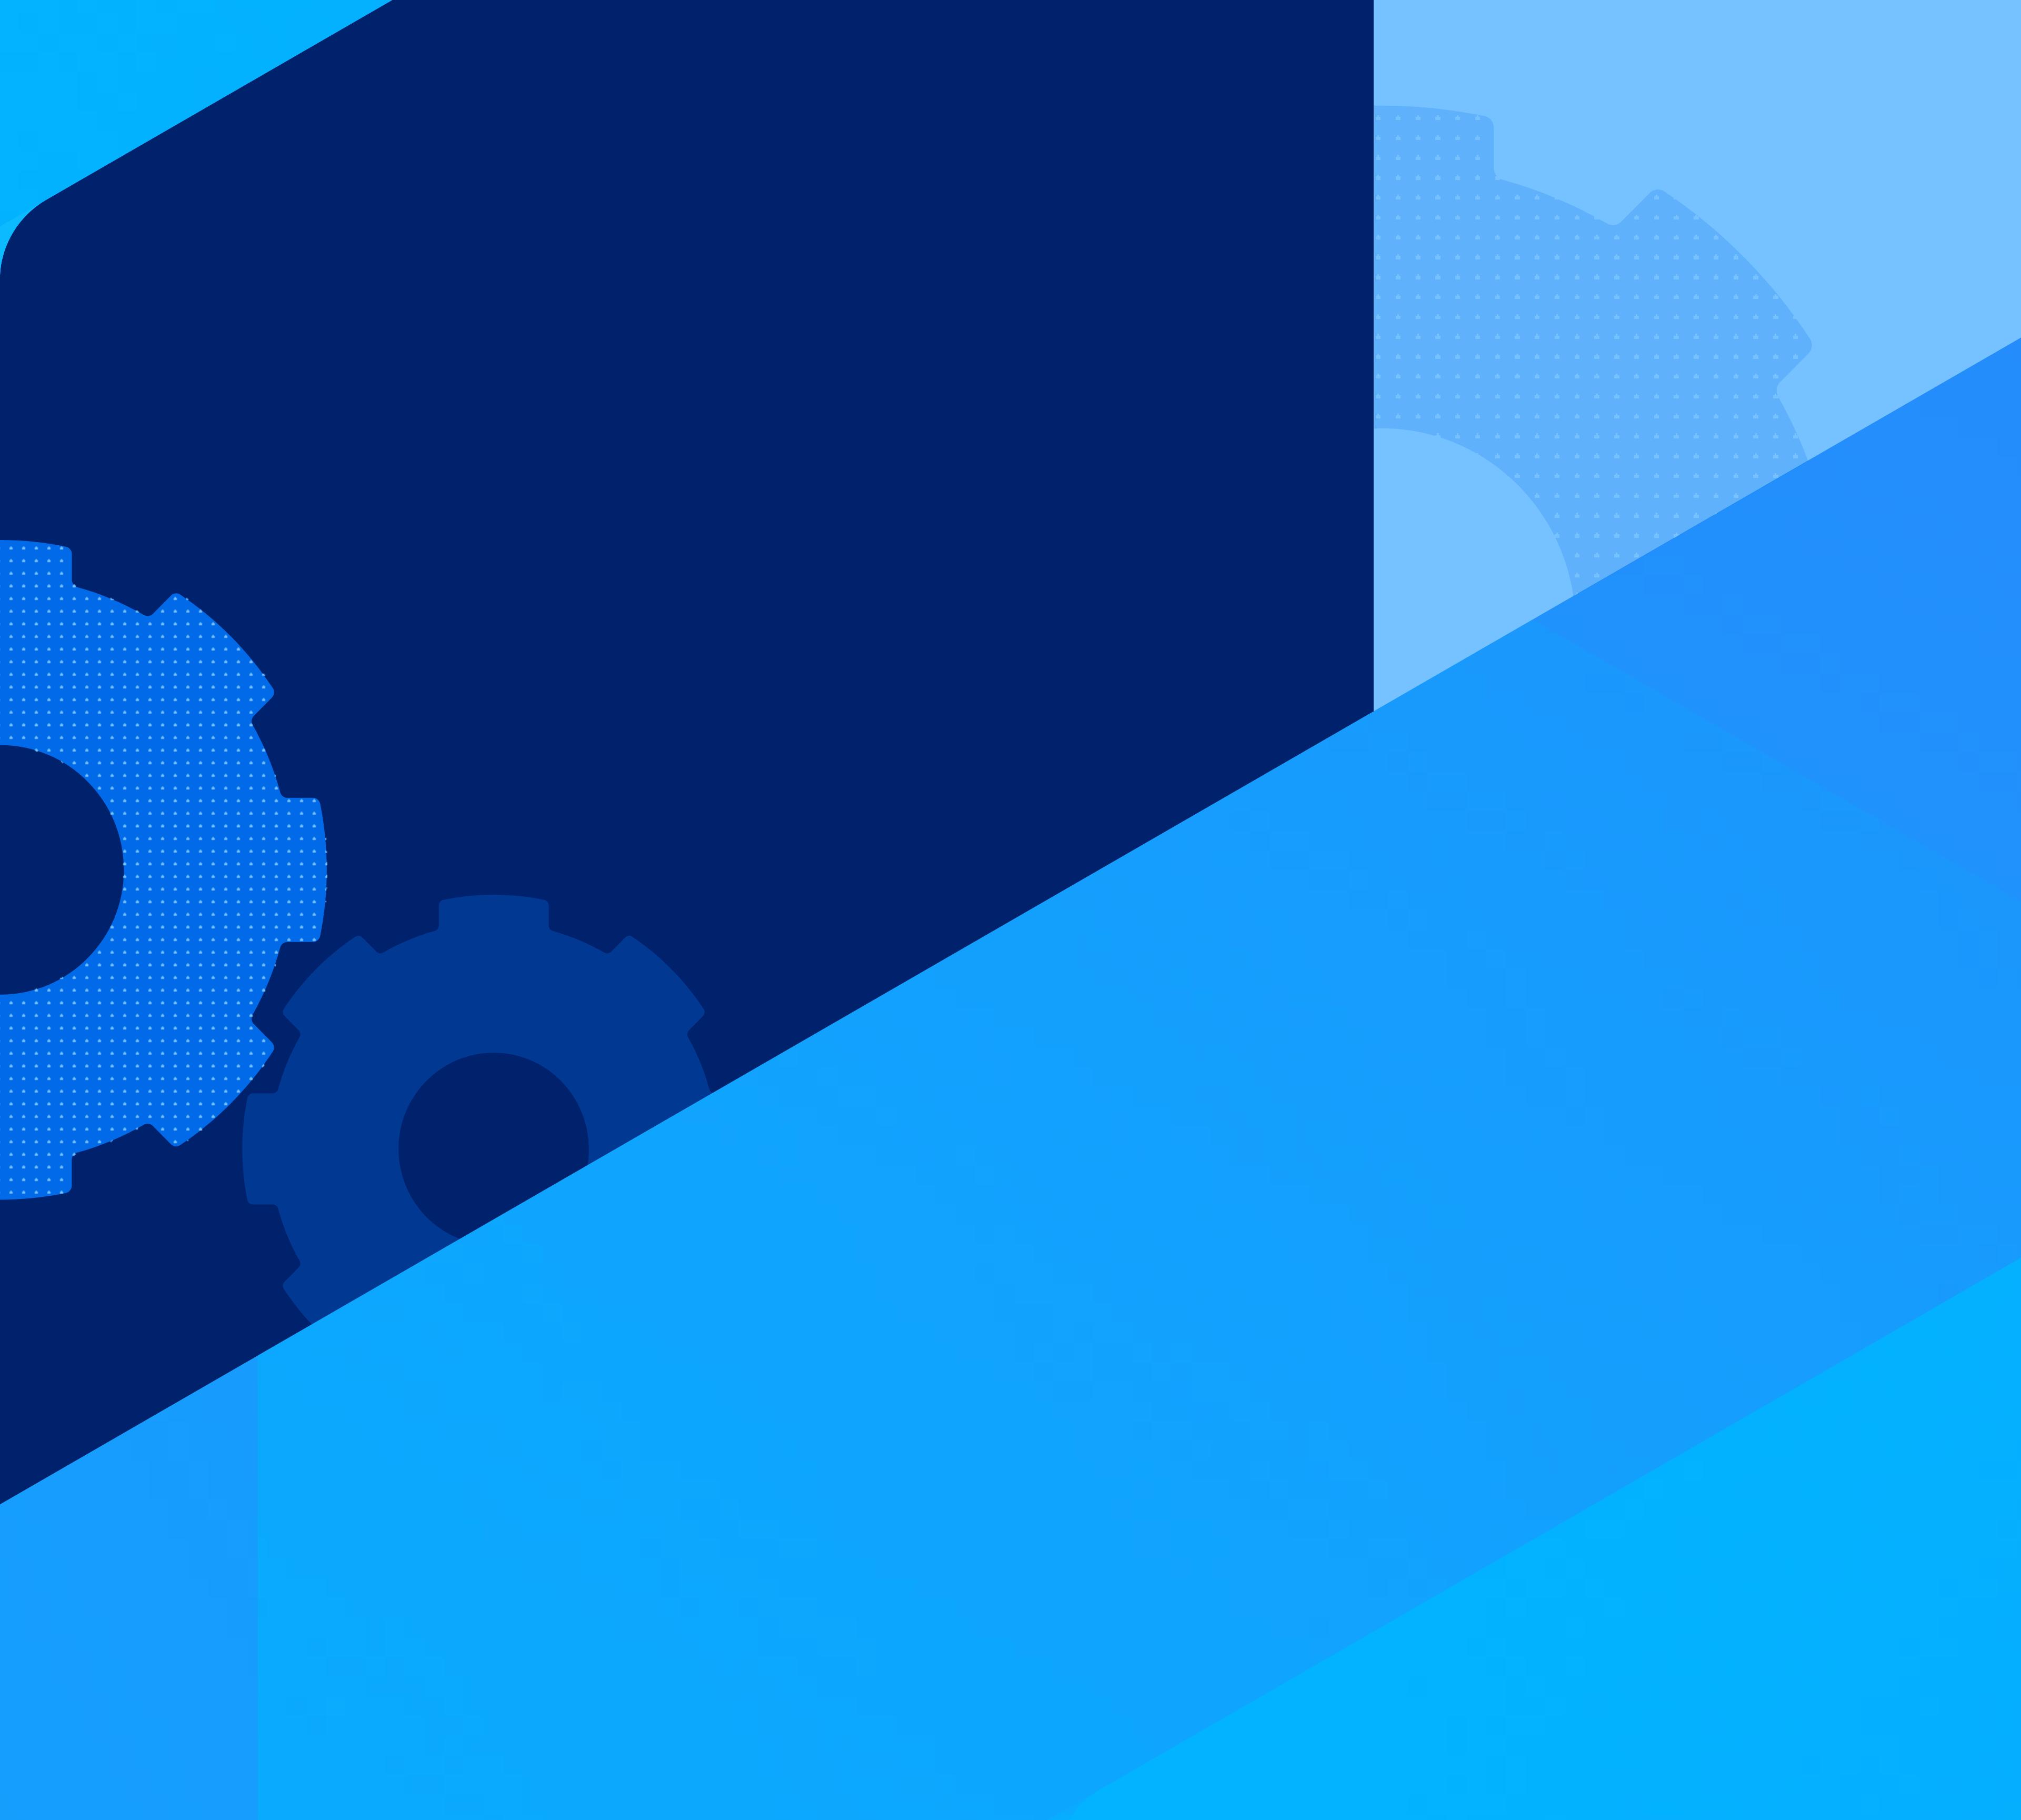 hero-background-min